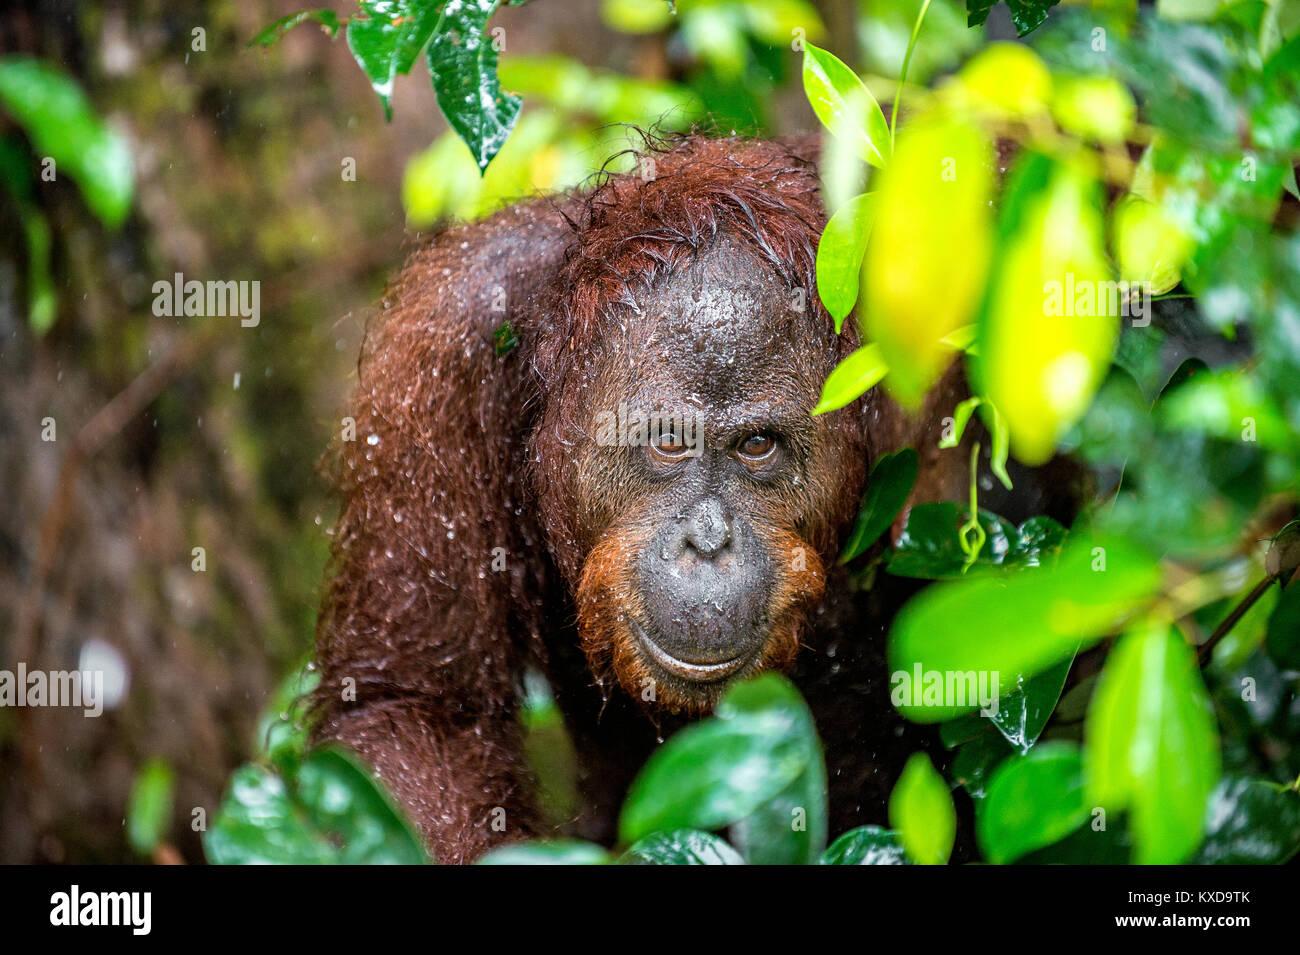 A close up portrait of the Bornean orangutan (Pongo pygmaeus) under rain in the wild nature. Central Bornean orangutan - Stock Image